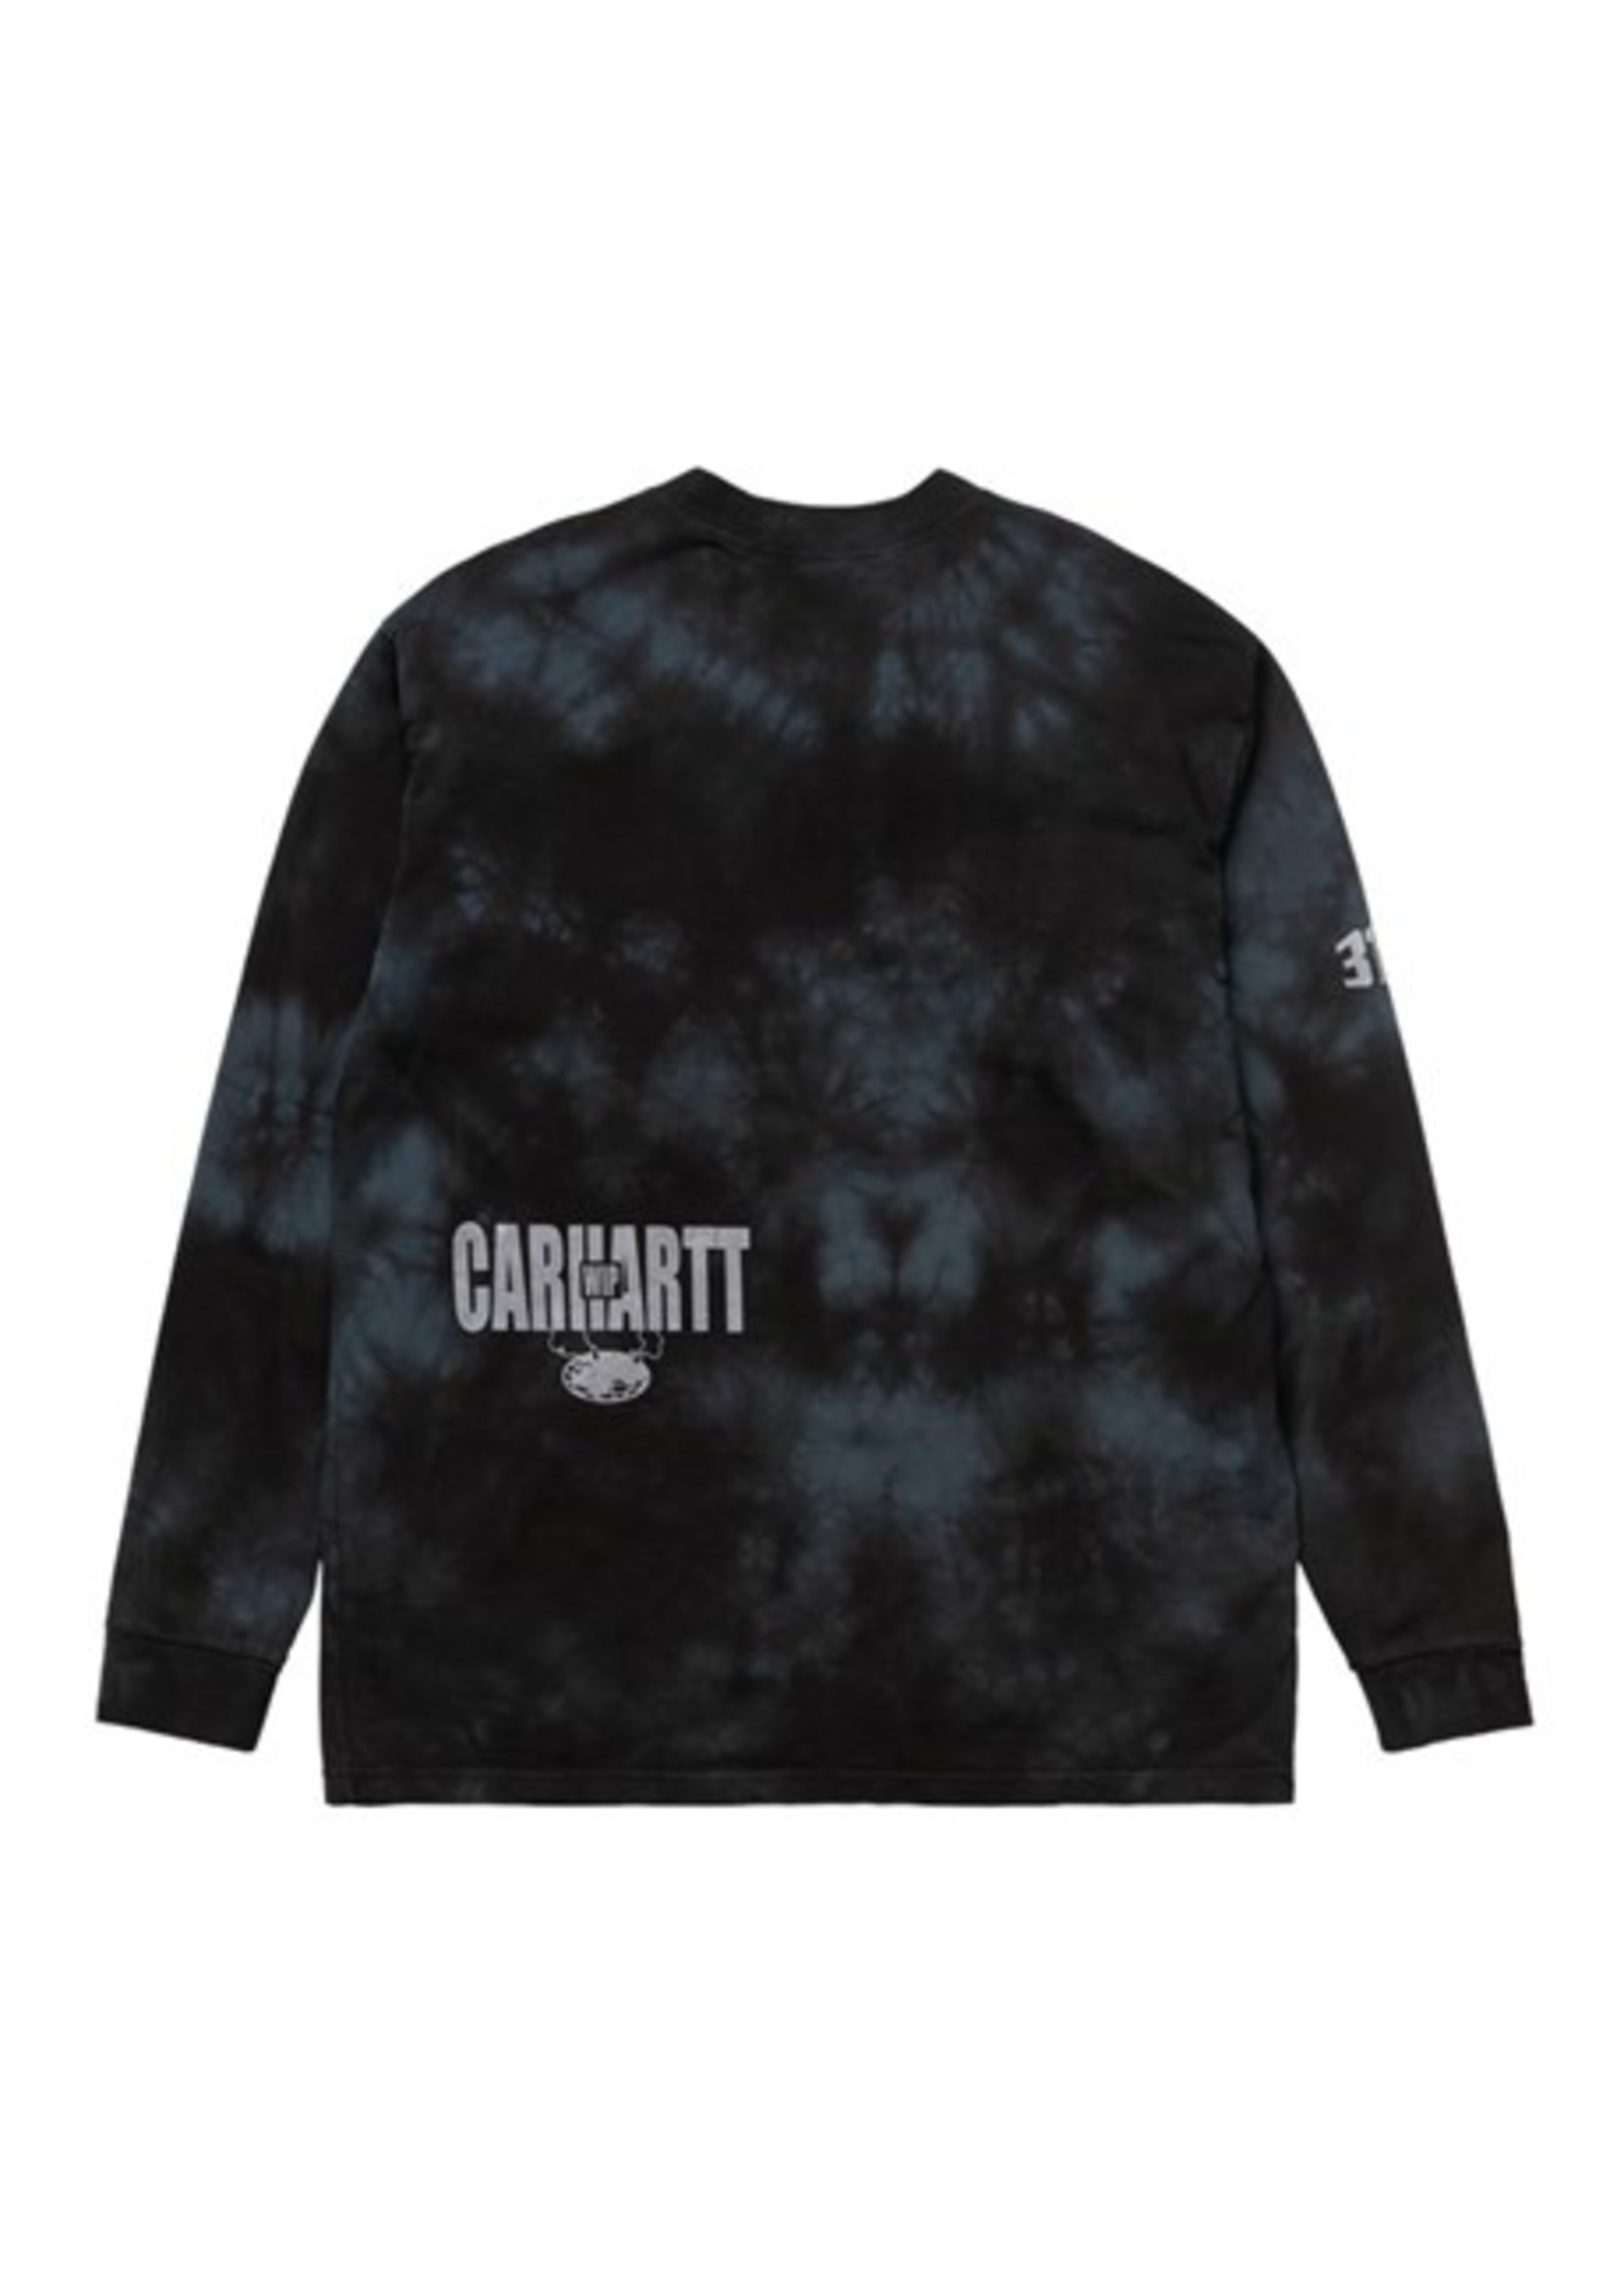 Carhartt Work In Progress Carhartt WIP Long Sleeve Tab Tee in Black Tie Dye